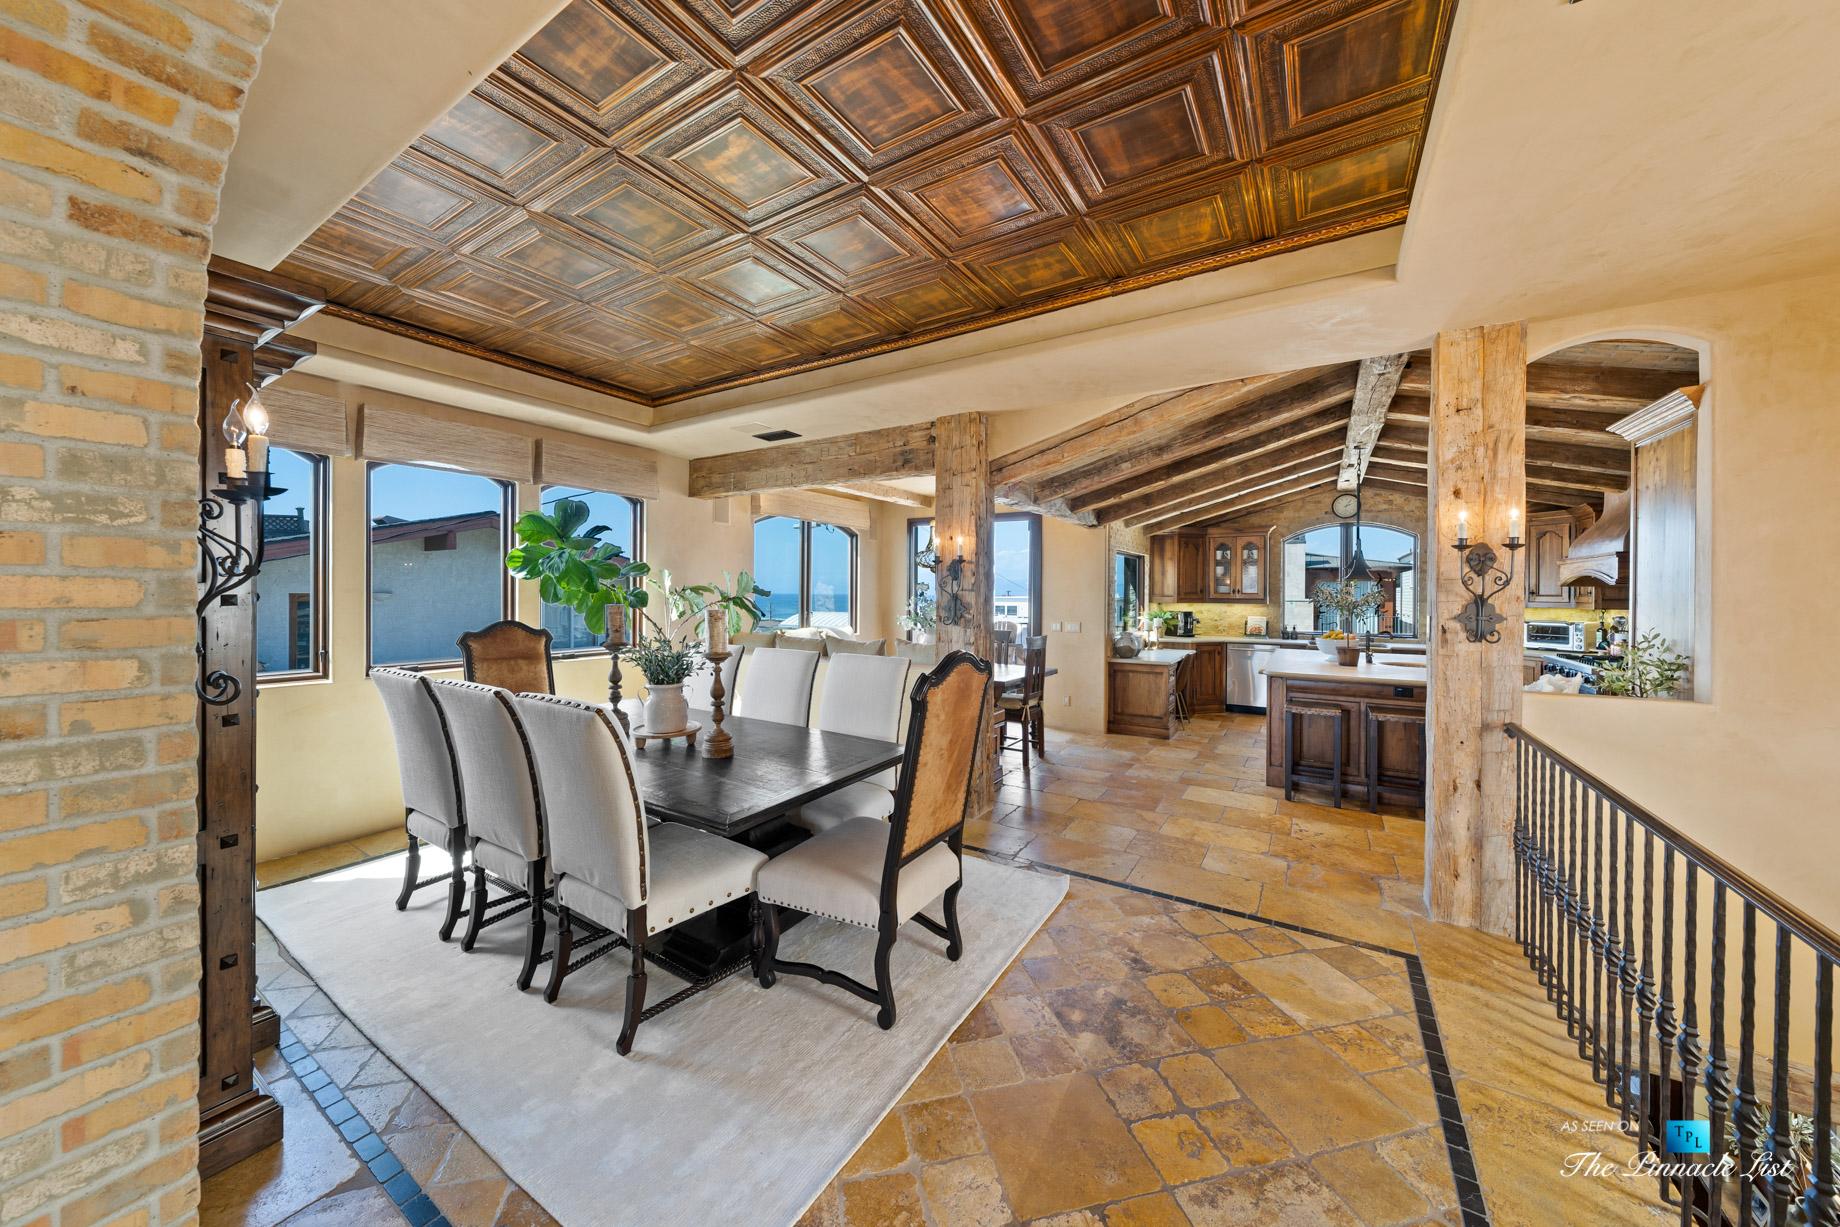 216 7th St, Manhattan Beach, CA, USA - Luxury Real Estate - Coastal Villa Home - Dining Room and Kitchen